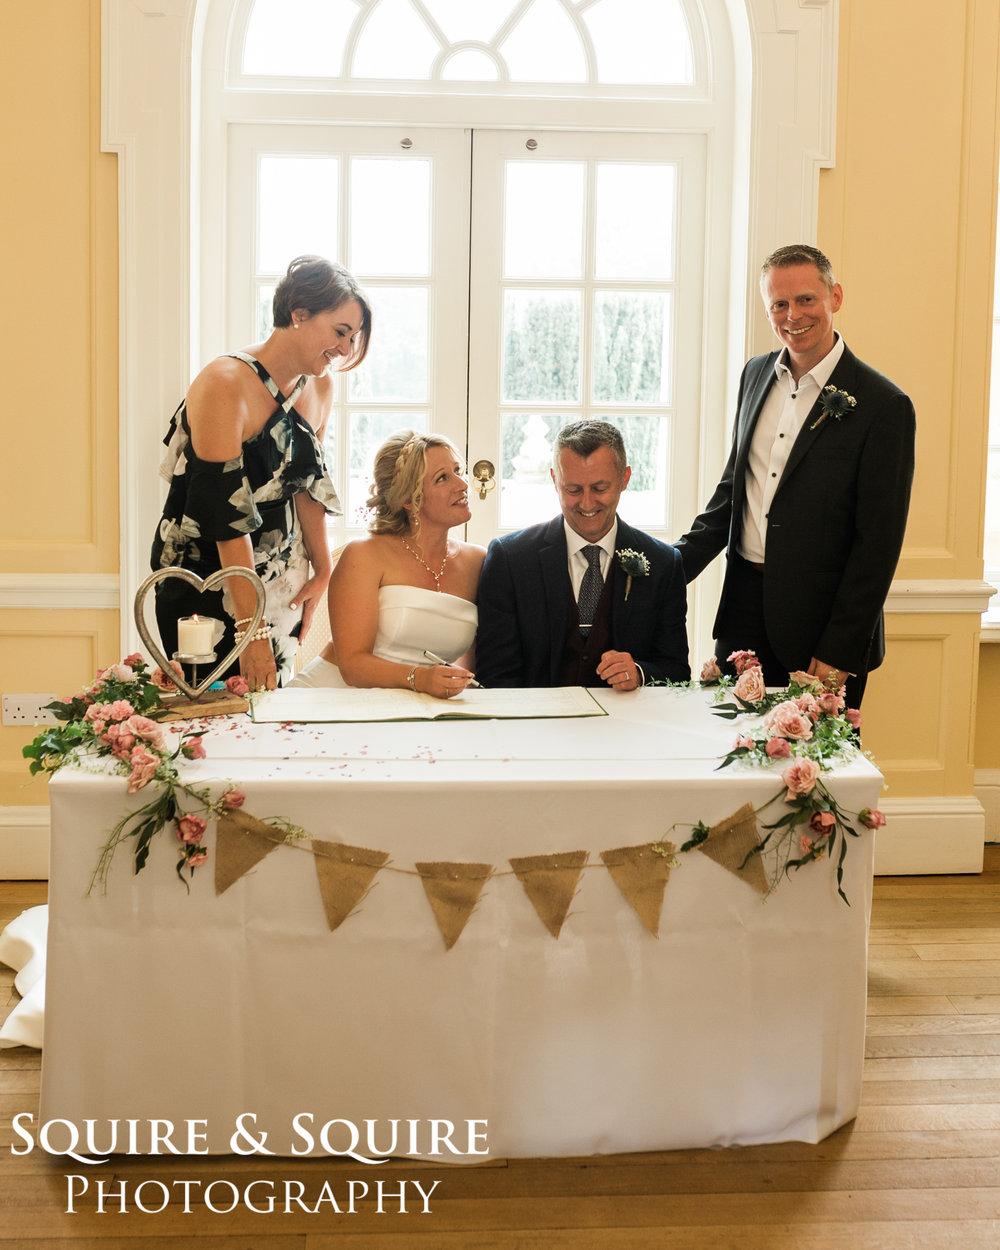 wedding_photography_catthorpe Manor (39 of 66).jpg